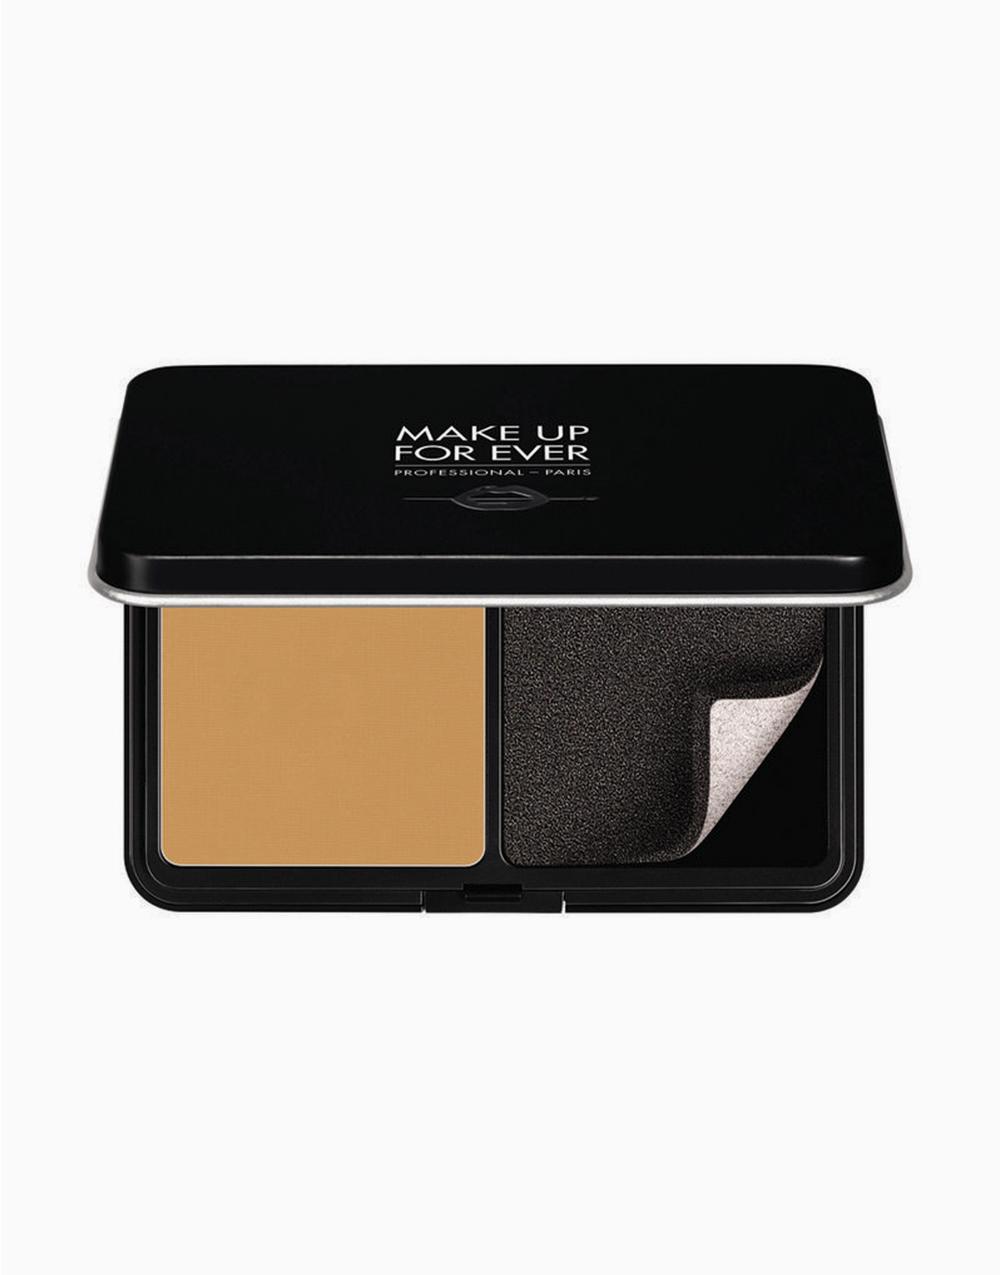 Matte Velvet Skin Compact (11g) by Make Up For Ever | Y425